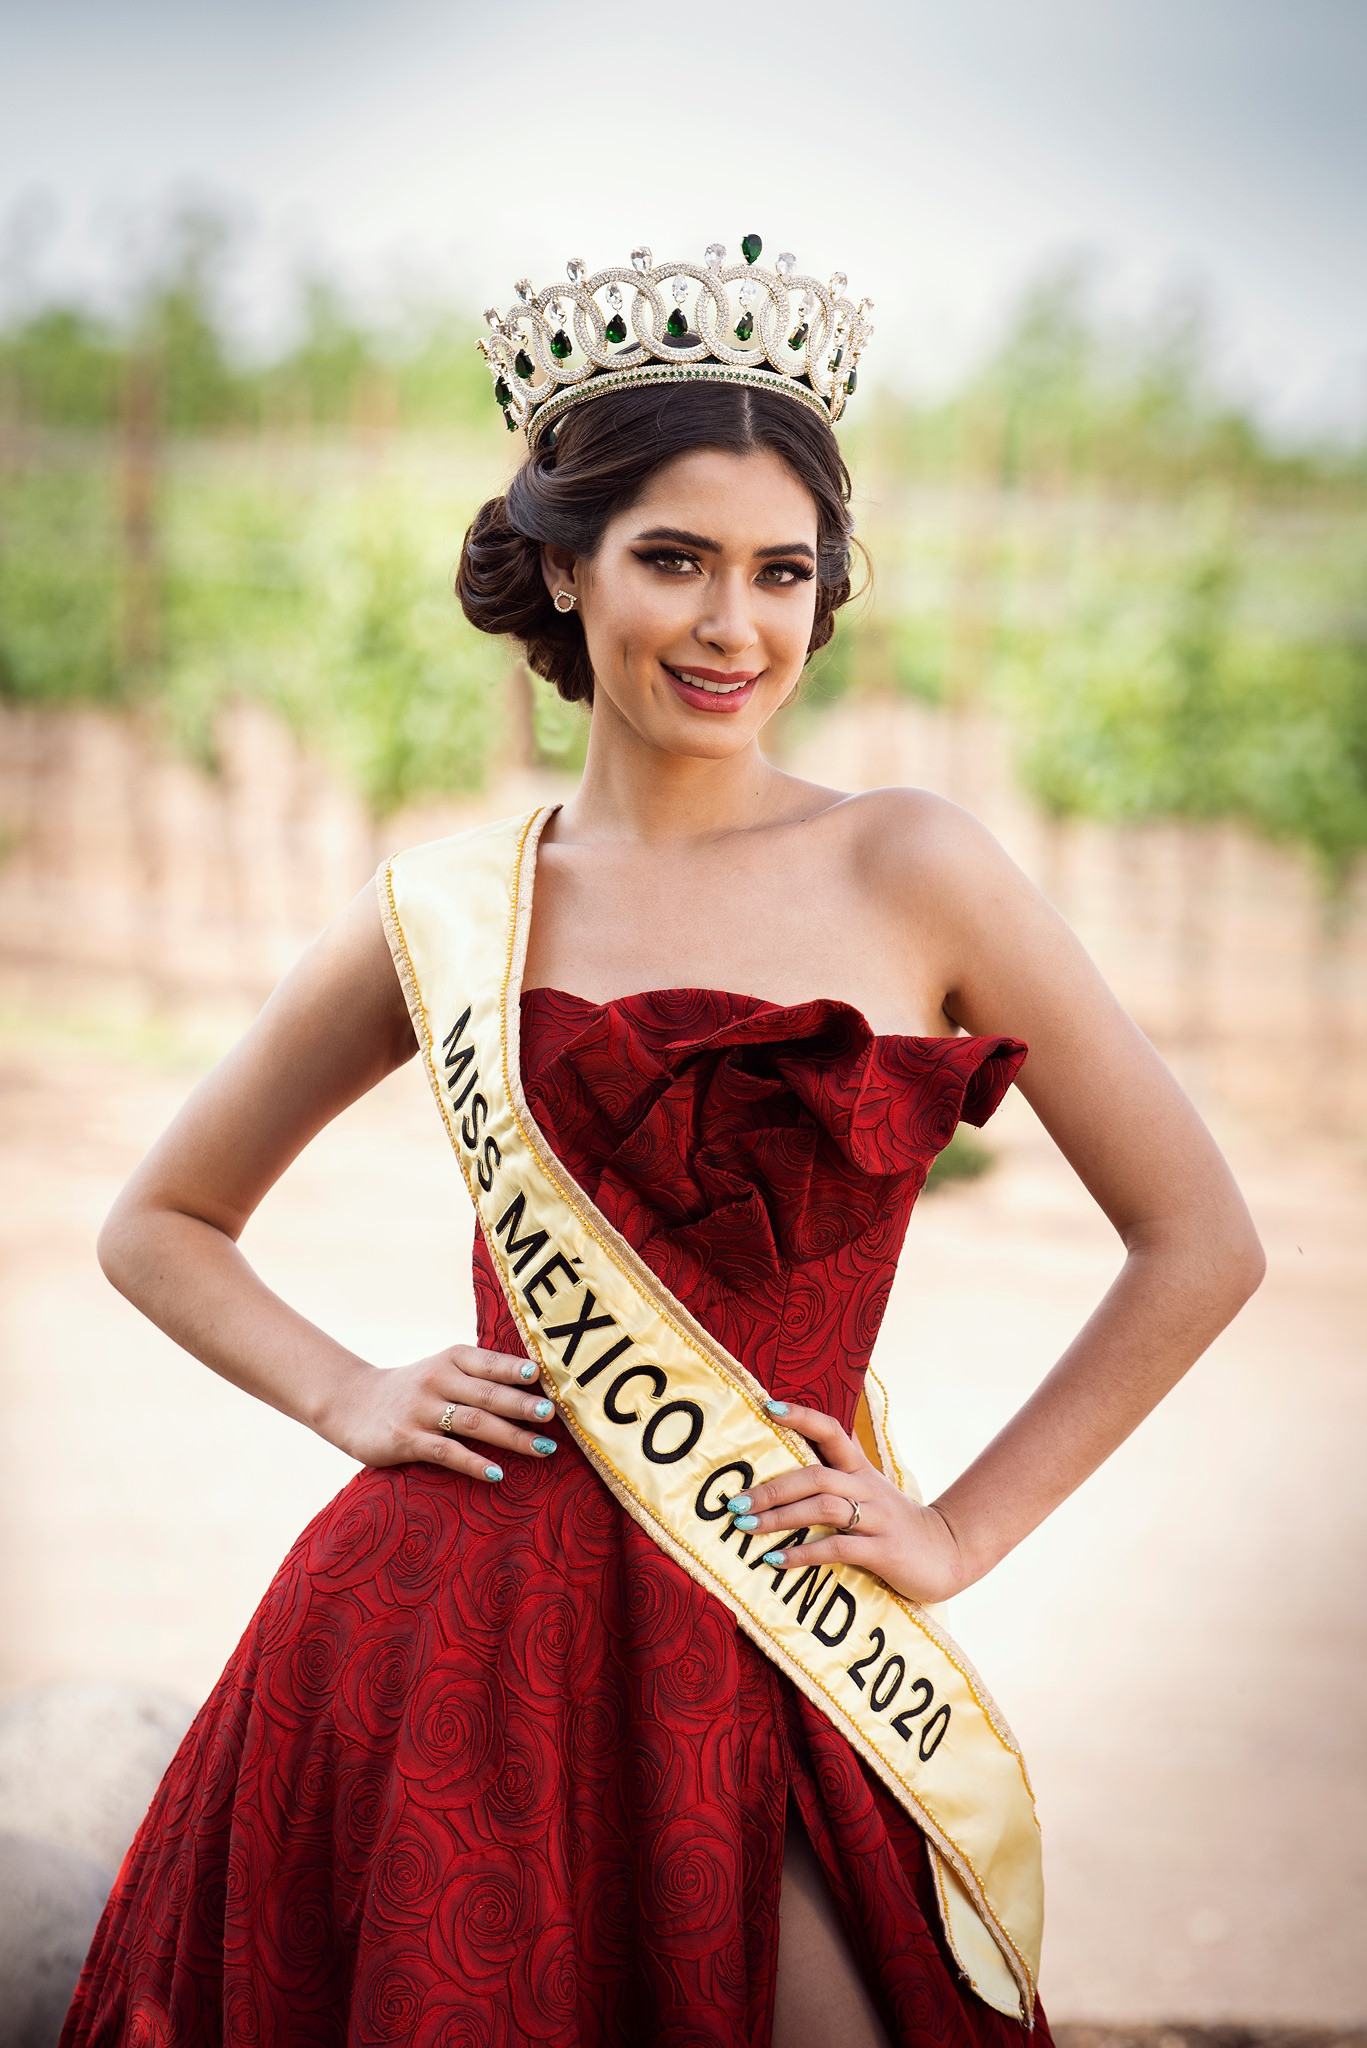 angela leon yuriar, top 21 de miss grand international 2020. - Página 32 Nlpl1p10